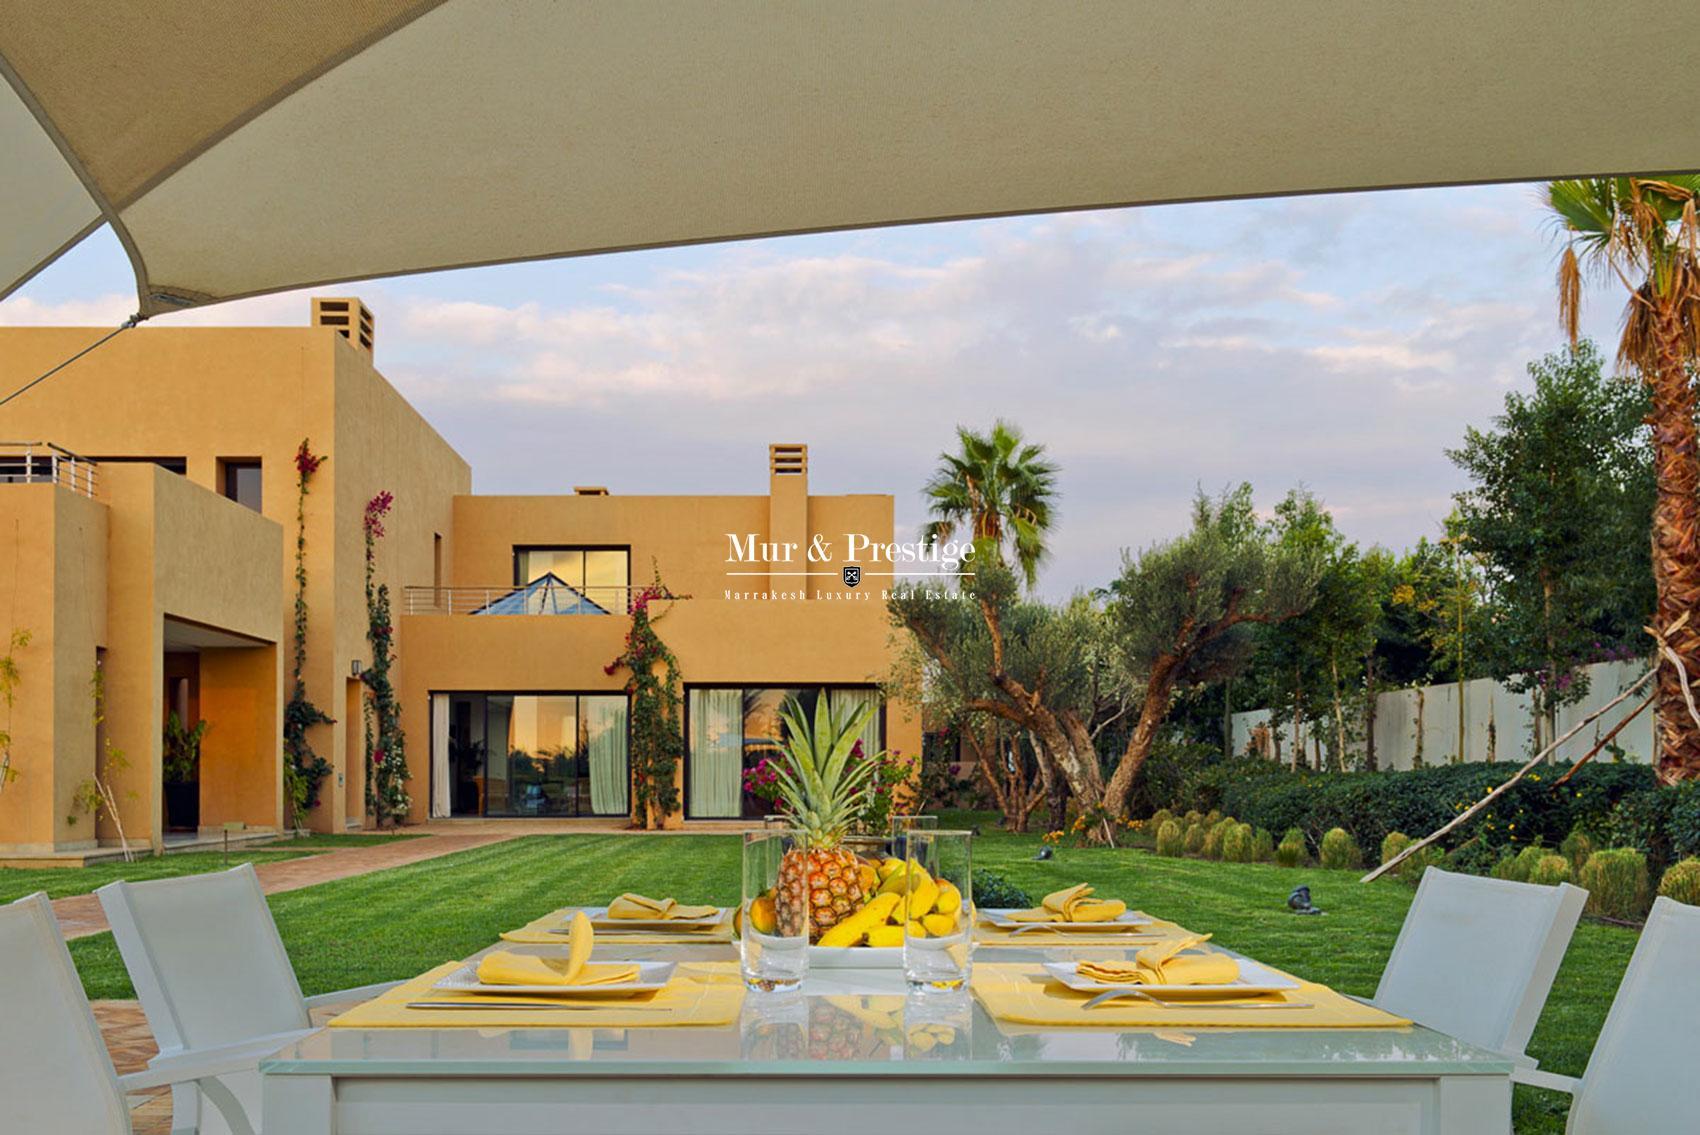 Vente propriete a Marrakech